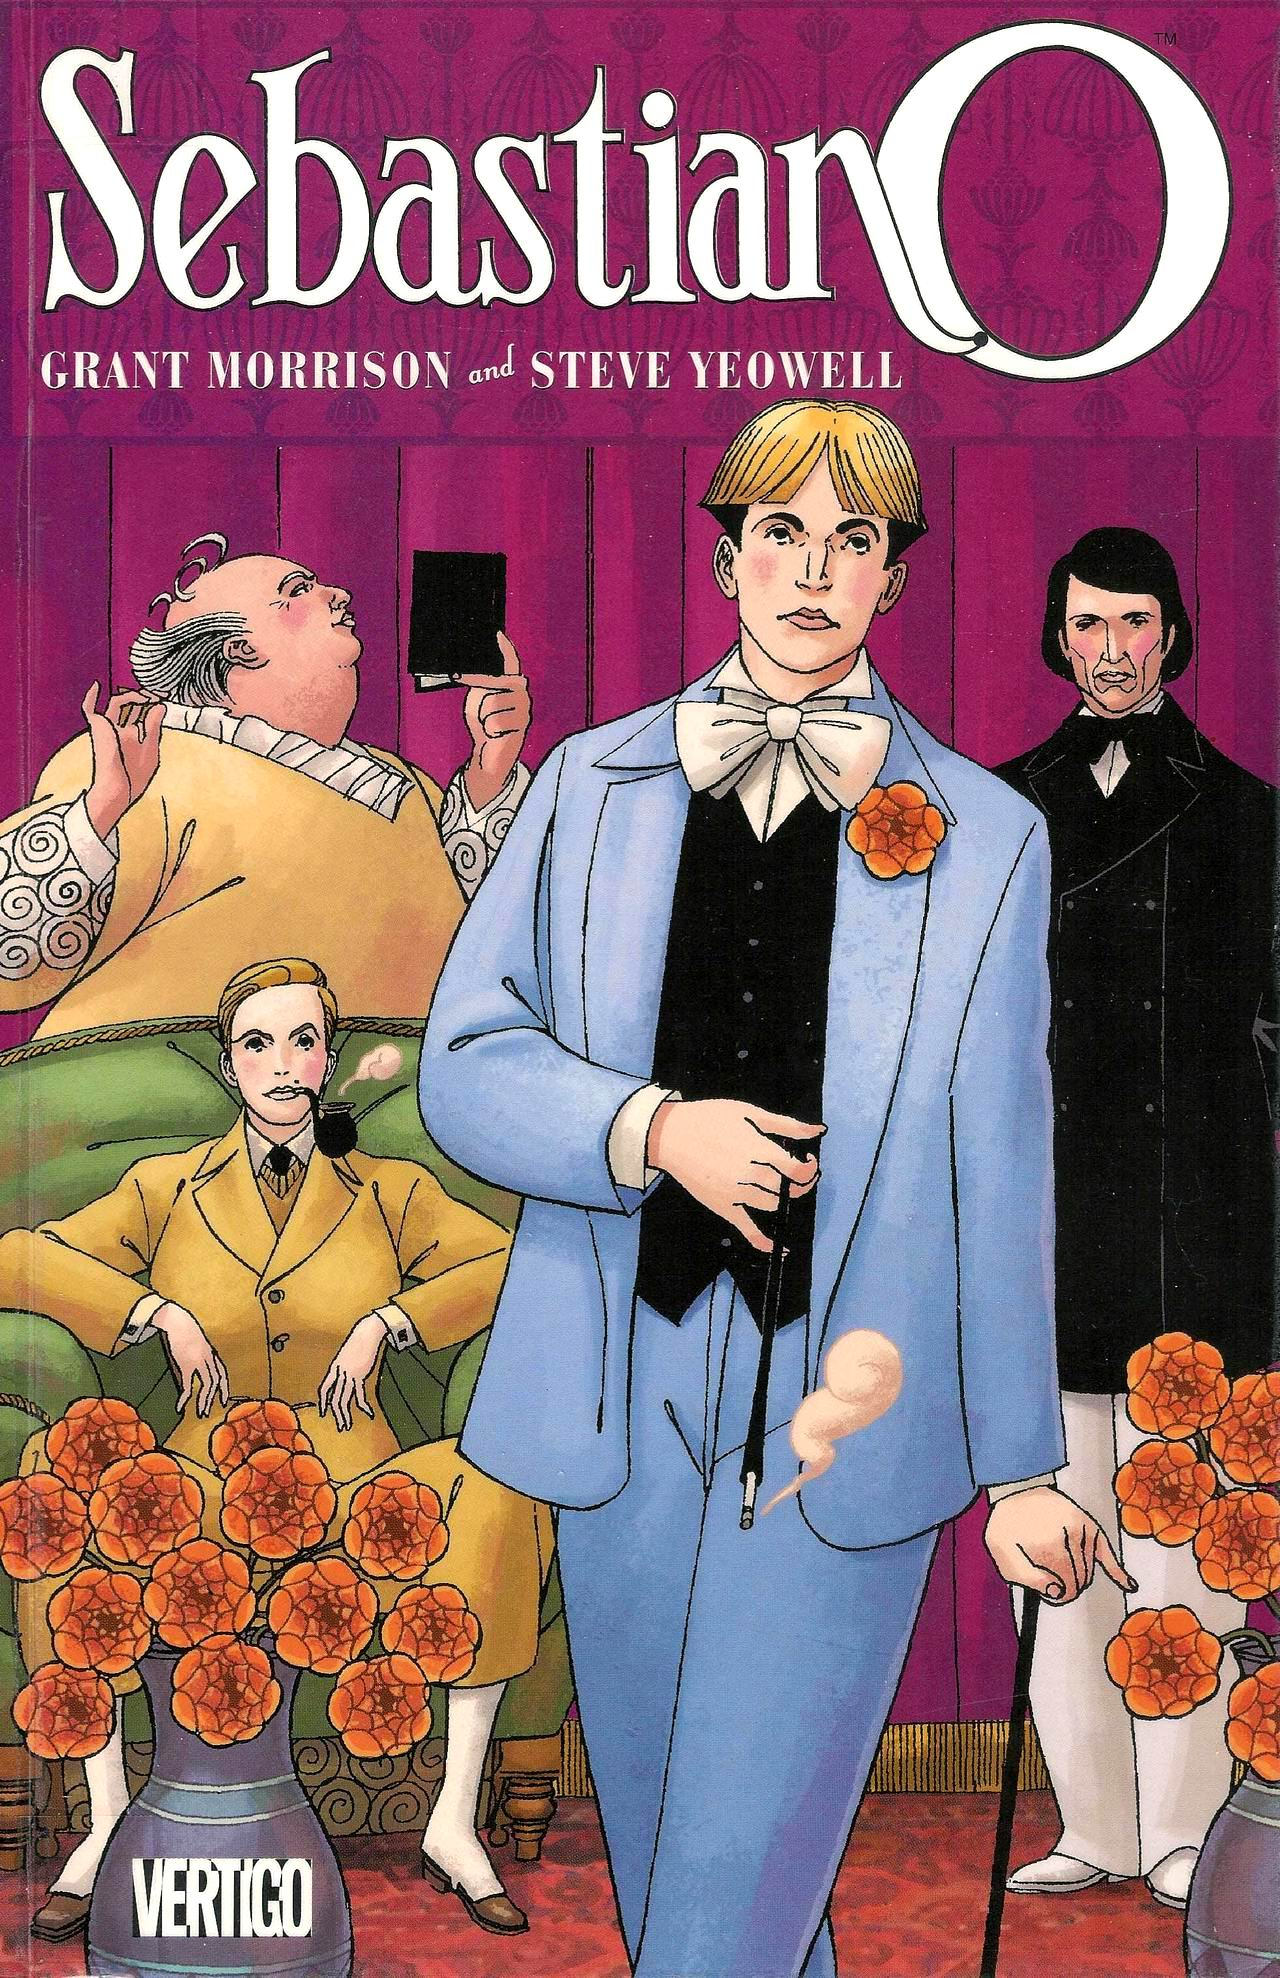 Read online Sebastian O comic -  Issue # _TPB - 1